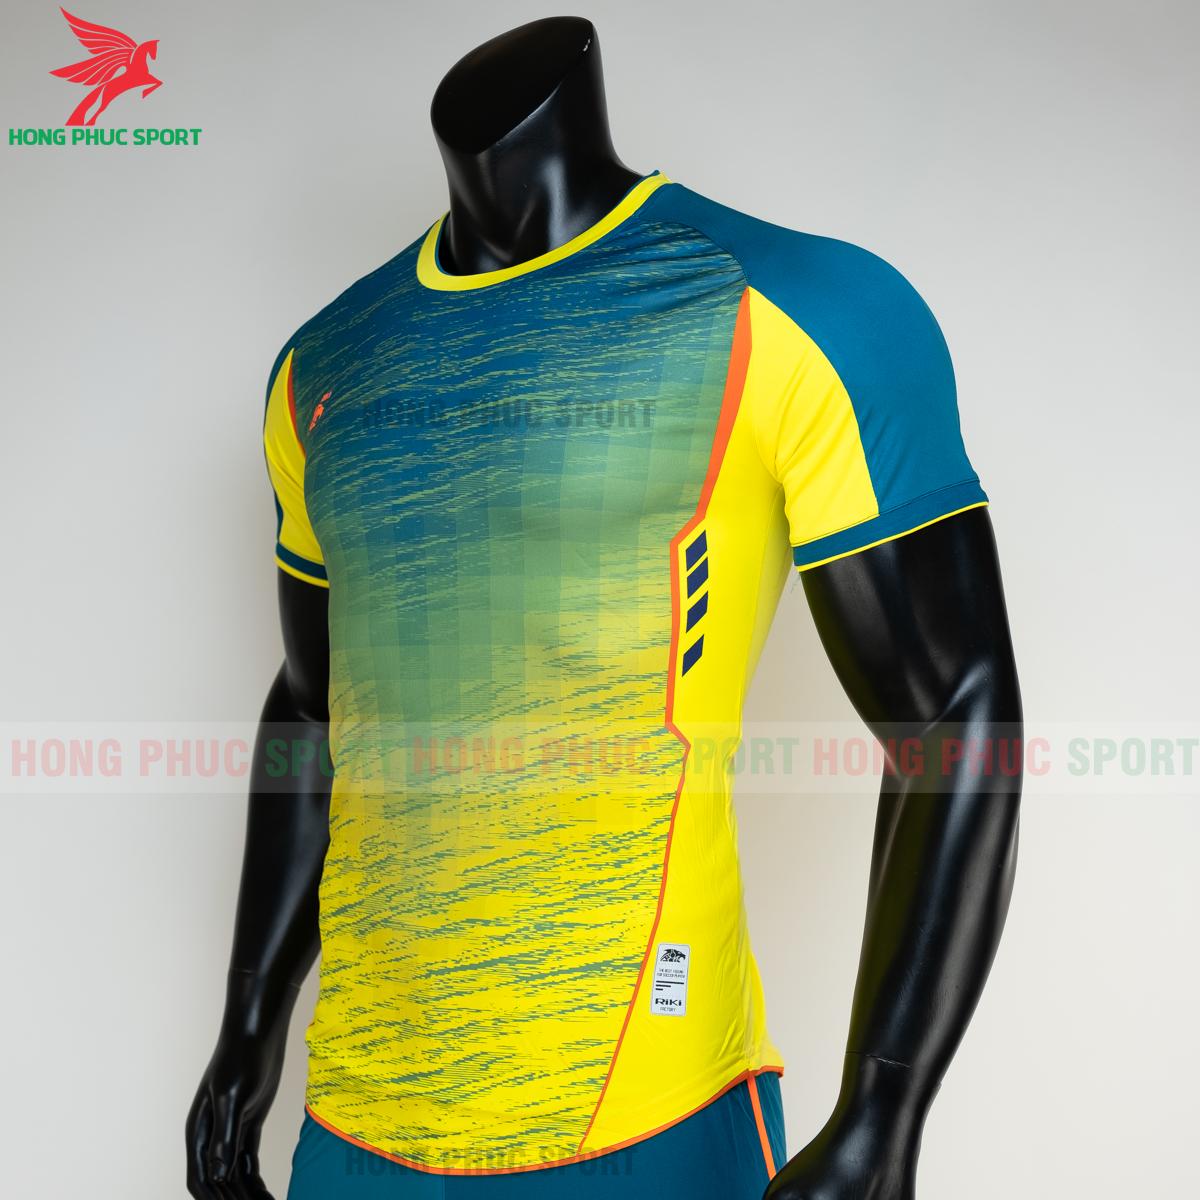 https://cdn.hongphucsport.com/unsafe/s4.shopbay.vn/files/285/ao-bong-da-khong-logo-riki-grambor-mau-vang-3-6050615edd8a1.png